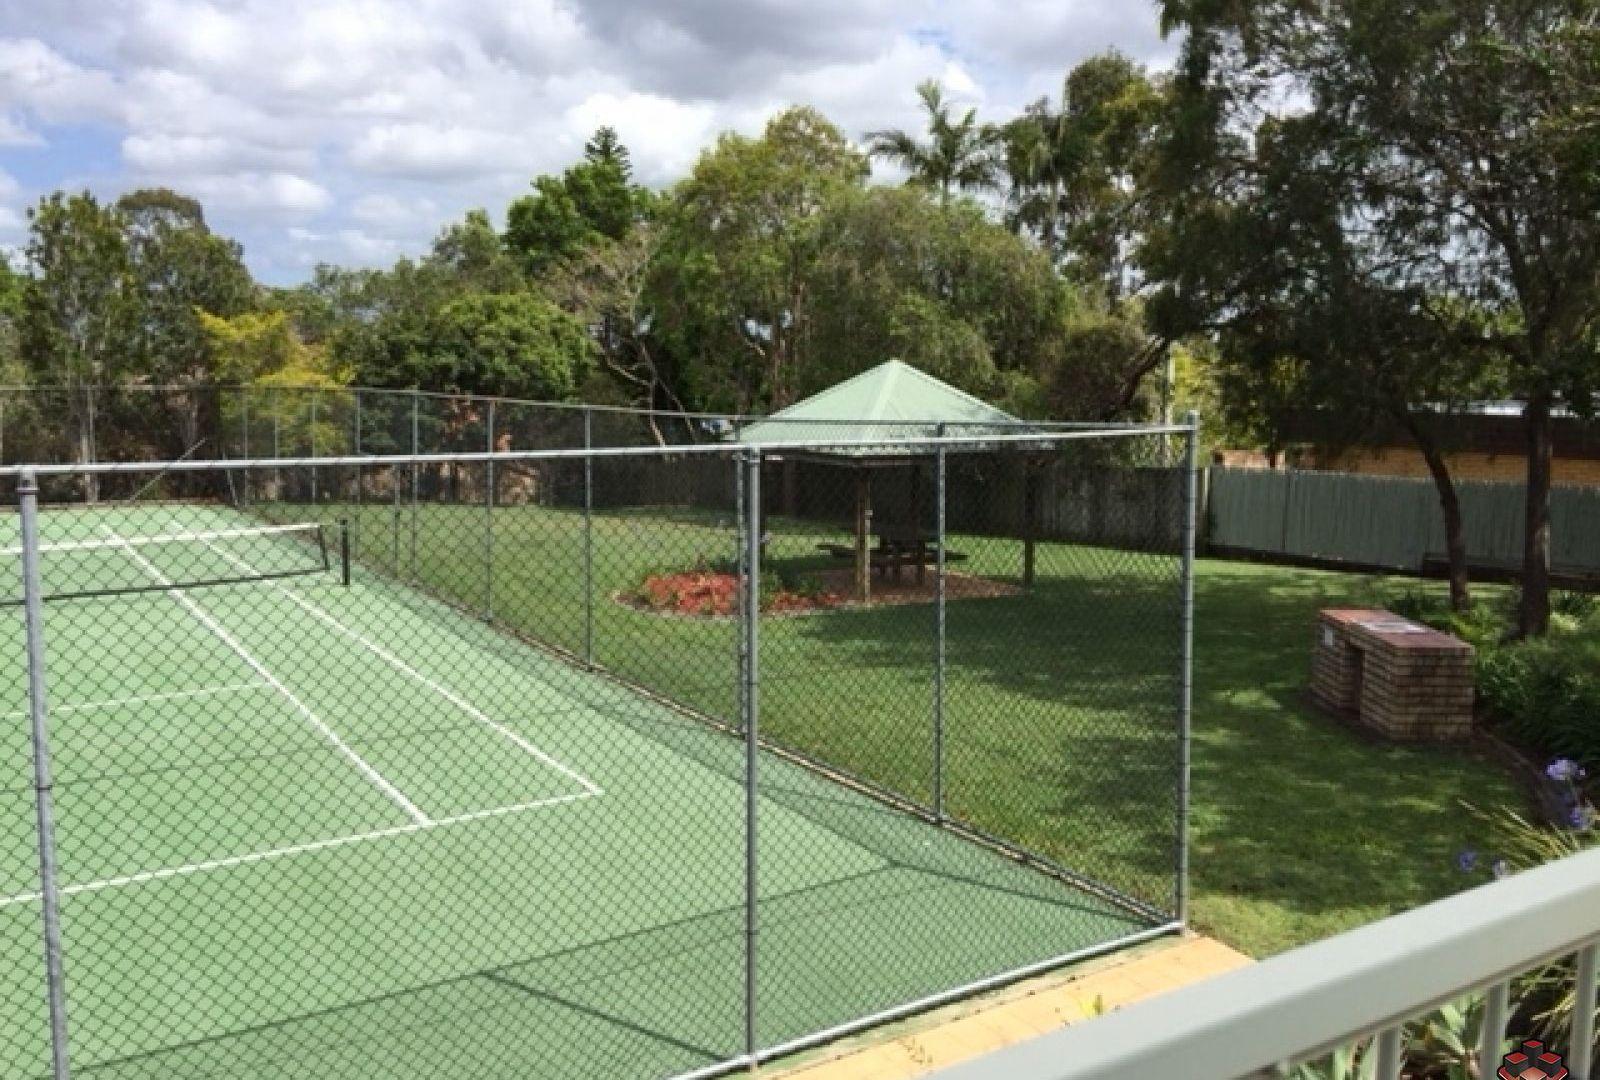 51-61 Bowen Street, Capalaba QLD 4157, Image 1